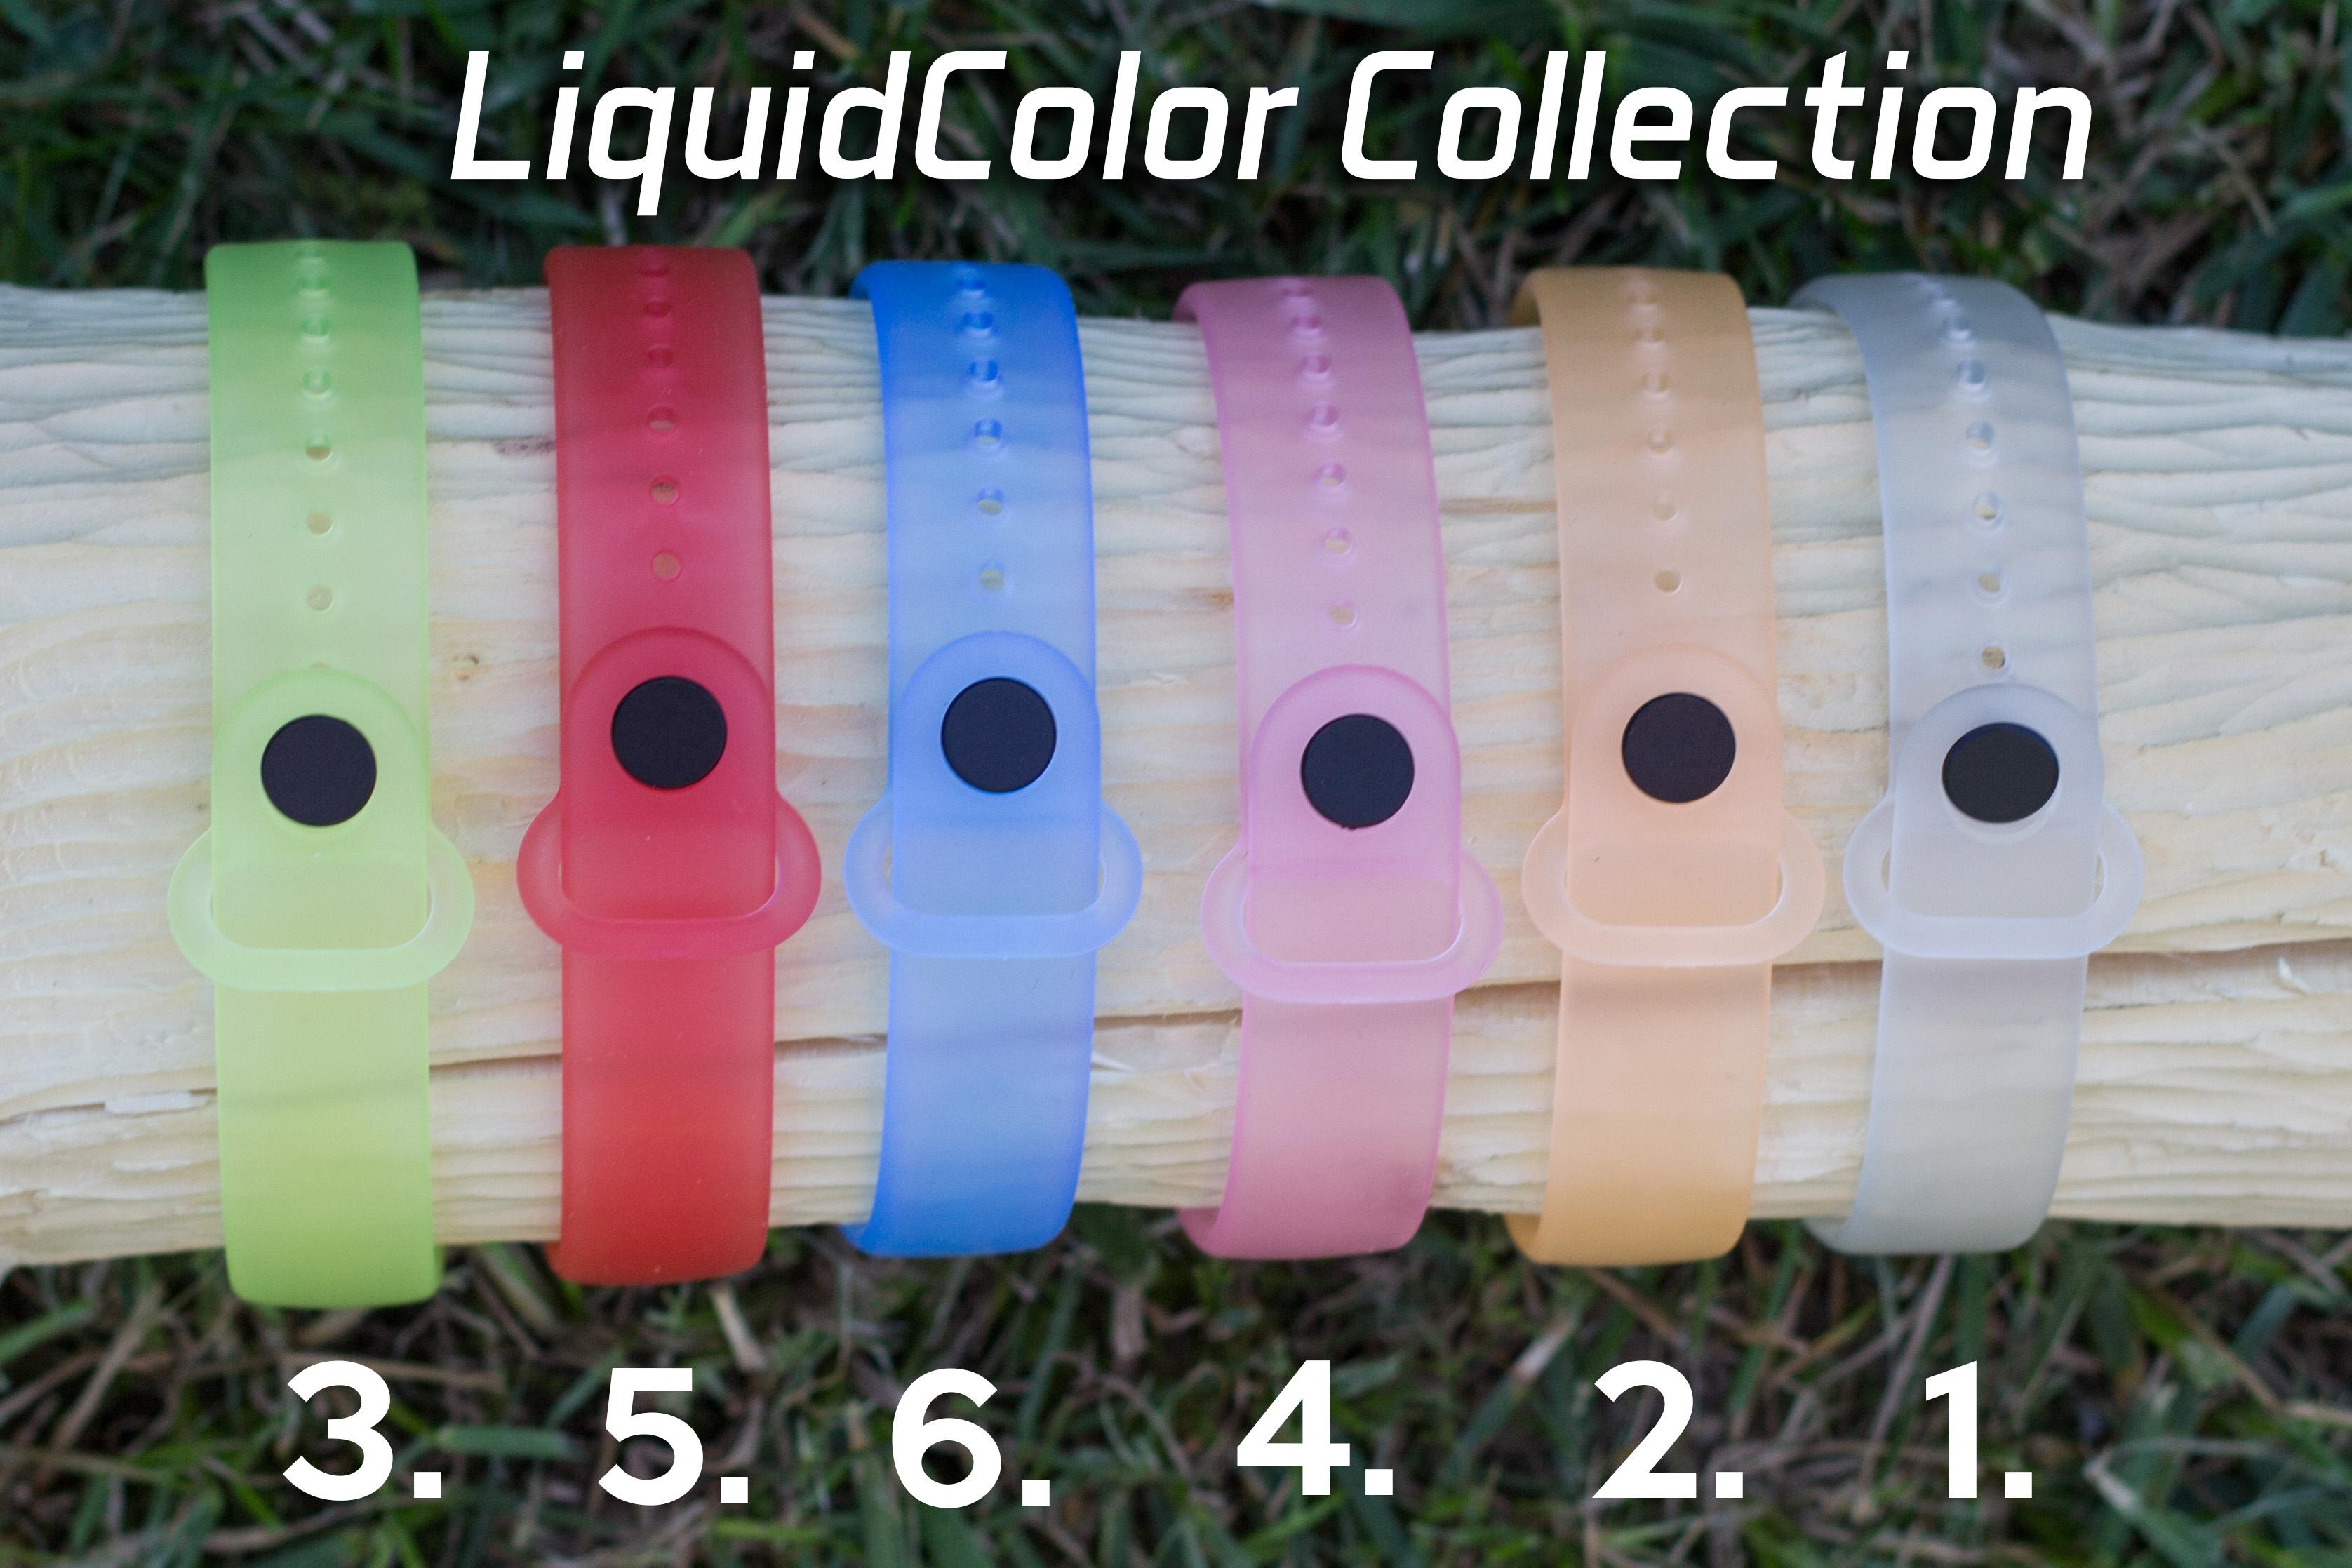 Mi Band 3 szilikon pánt - LiquidColor 2